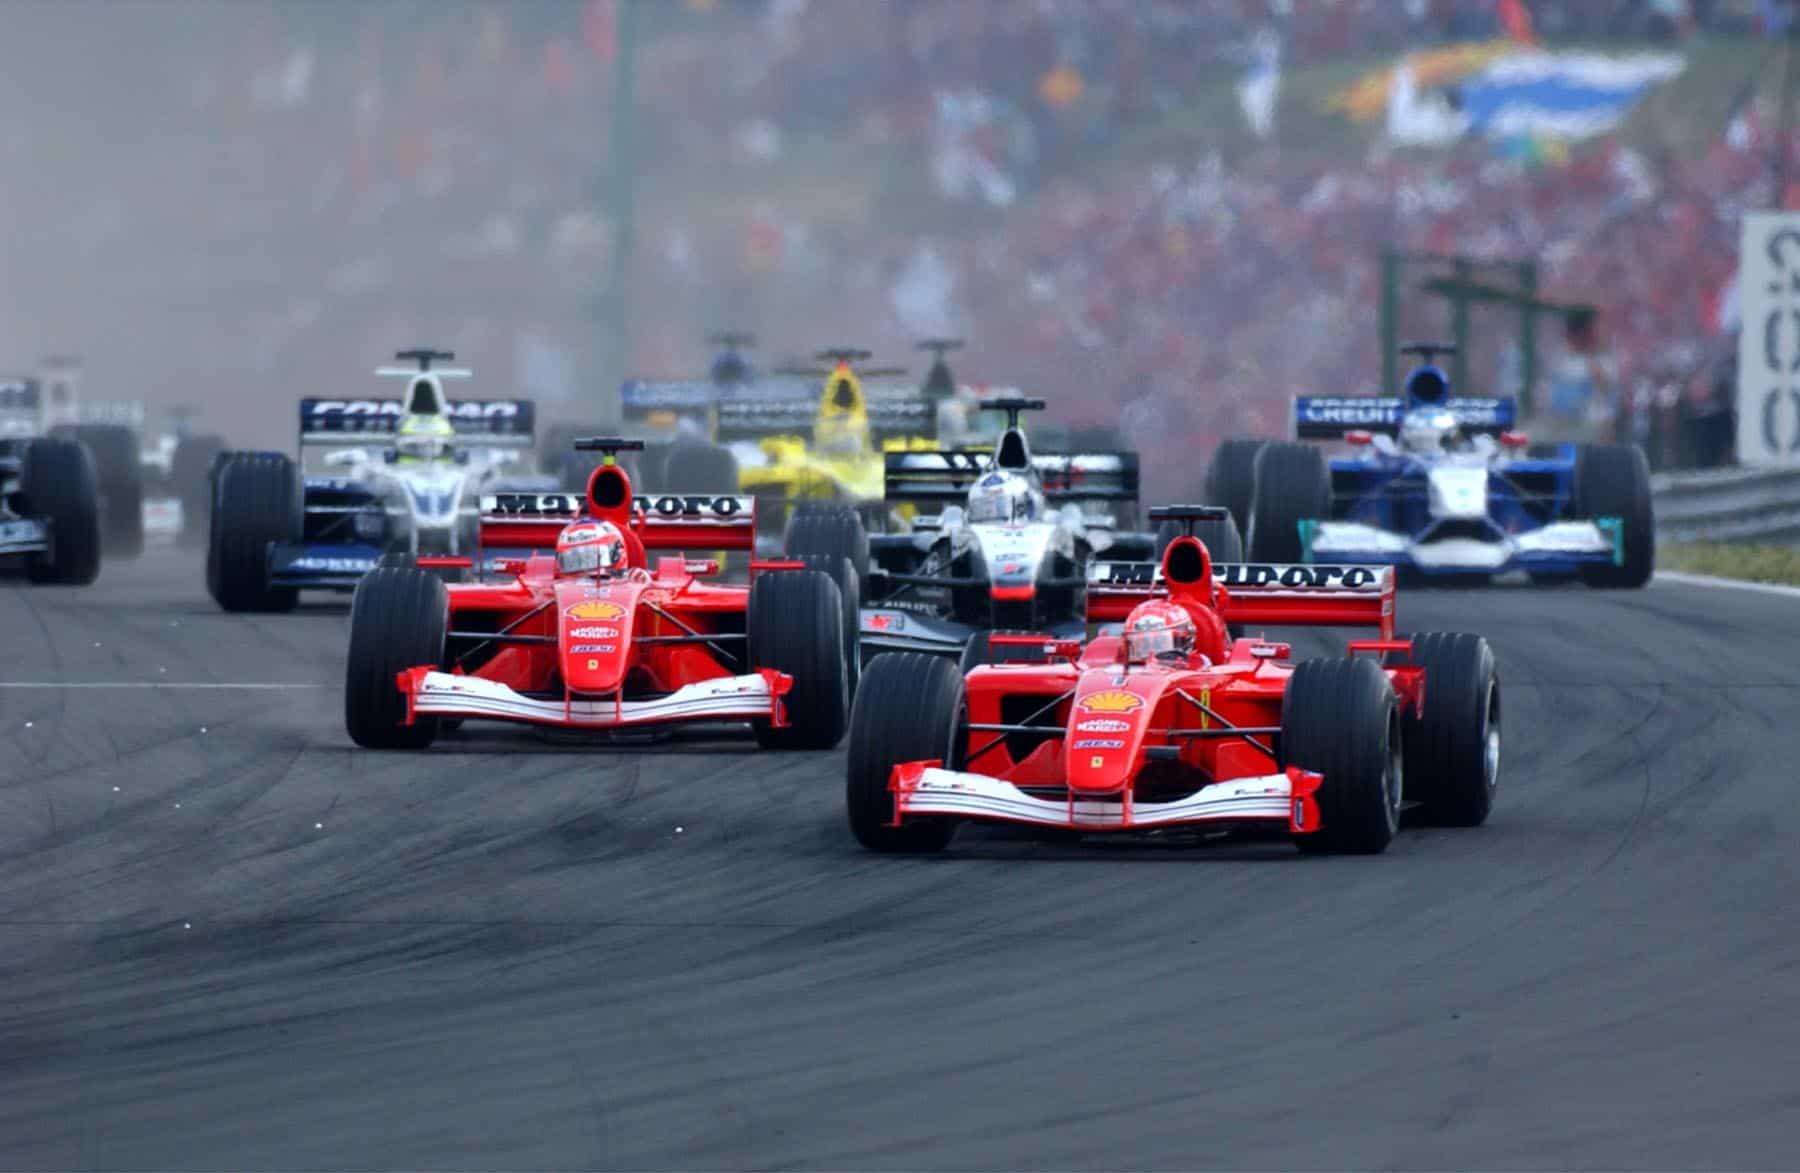 Hungarian GP F1 2001 start Photo Ferrari